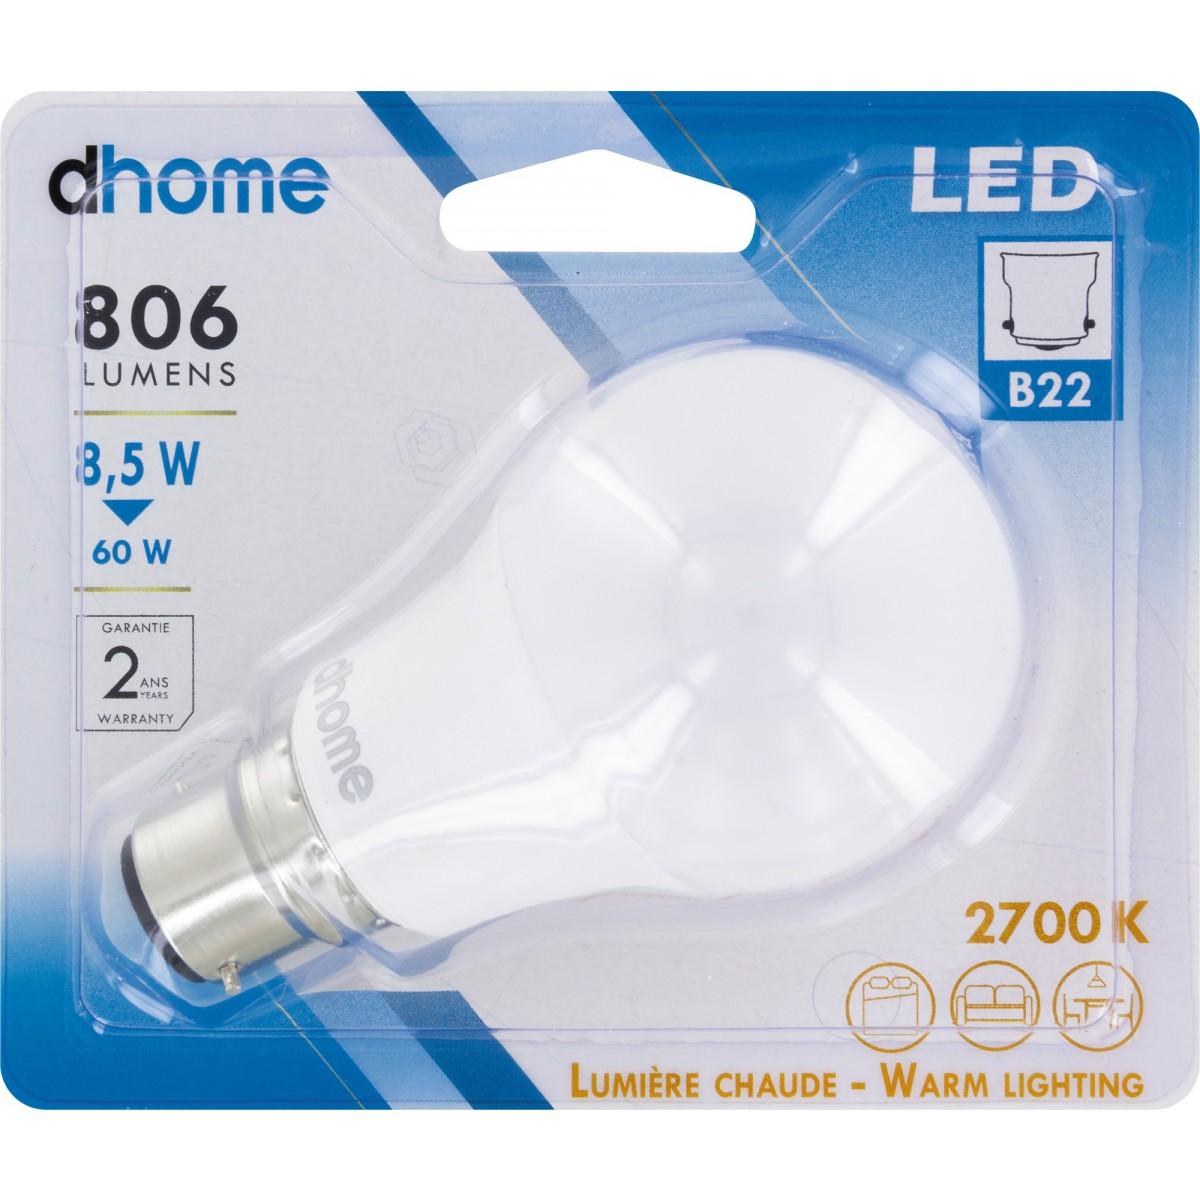 Ampoule LED standard B22 dhome - 806 Lumens - 8,5 W - 2700 K